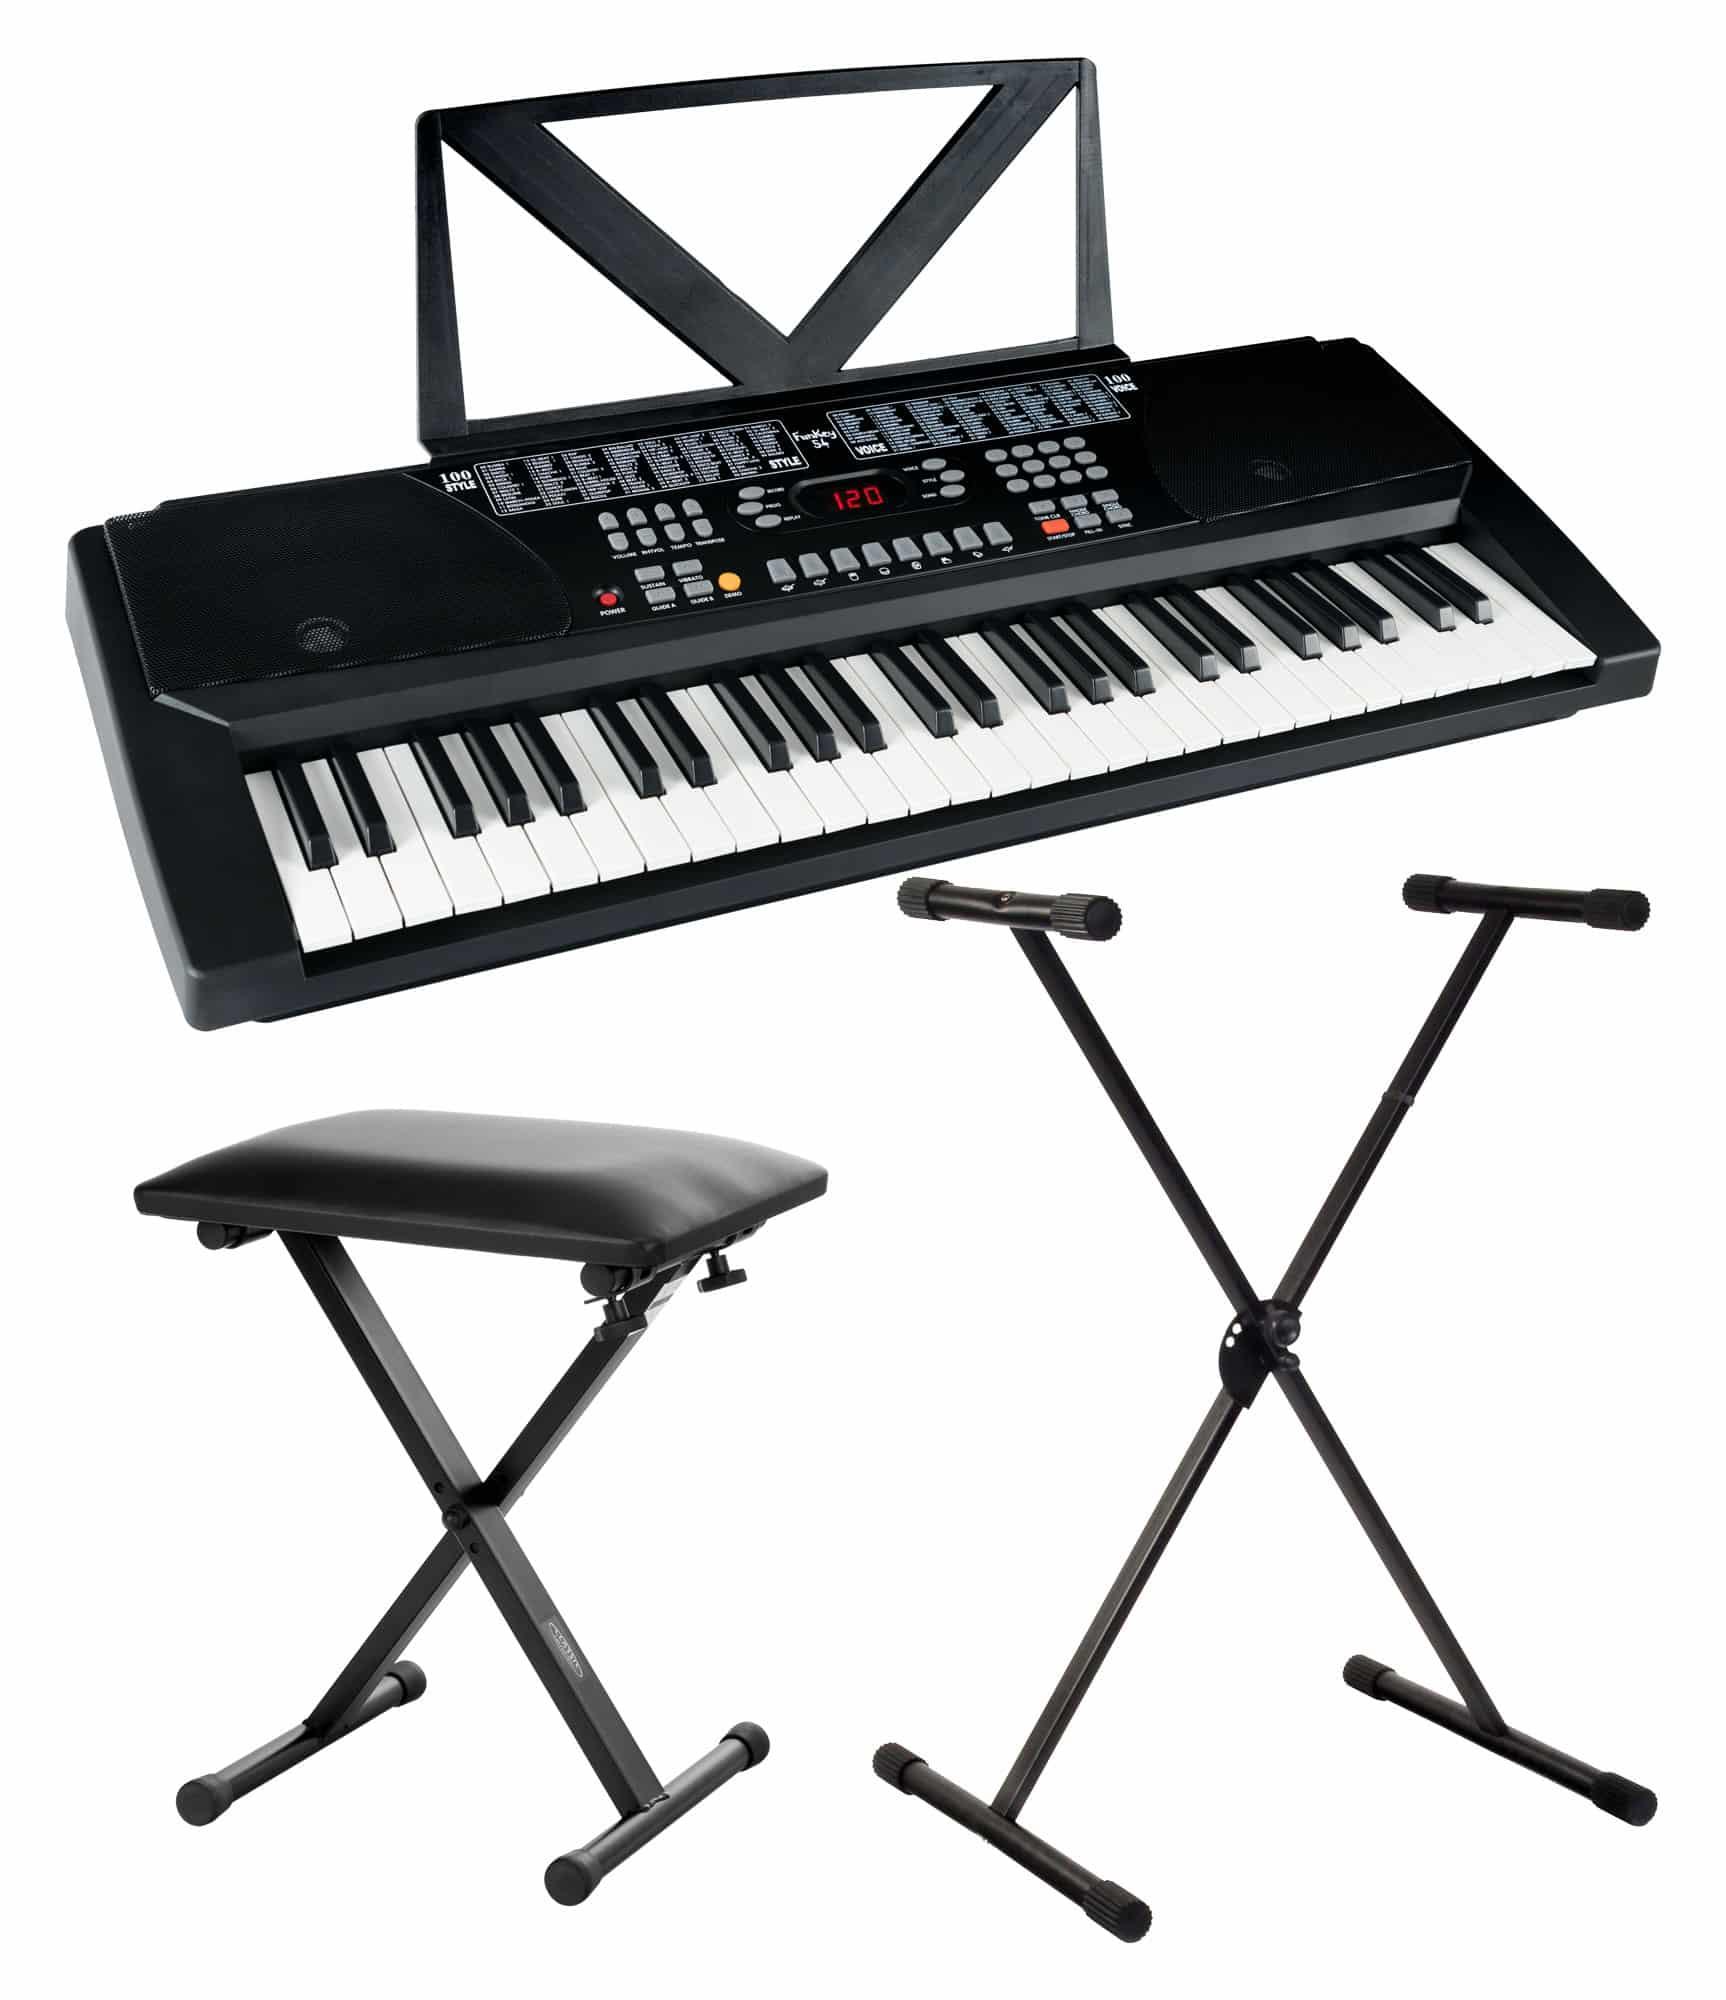 Digital Funkey 54-Tasten Keyboard Ständer Stativ Klavier Sitz Bank Set E-Piano